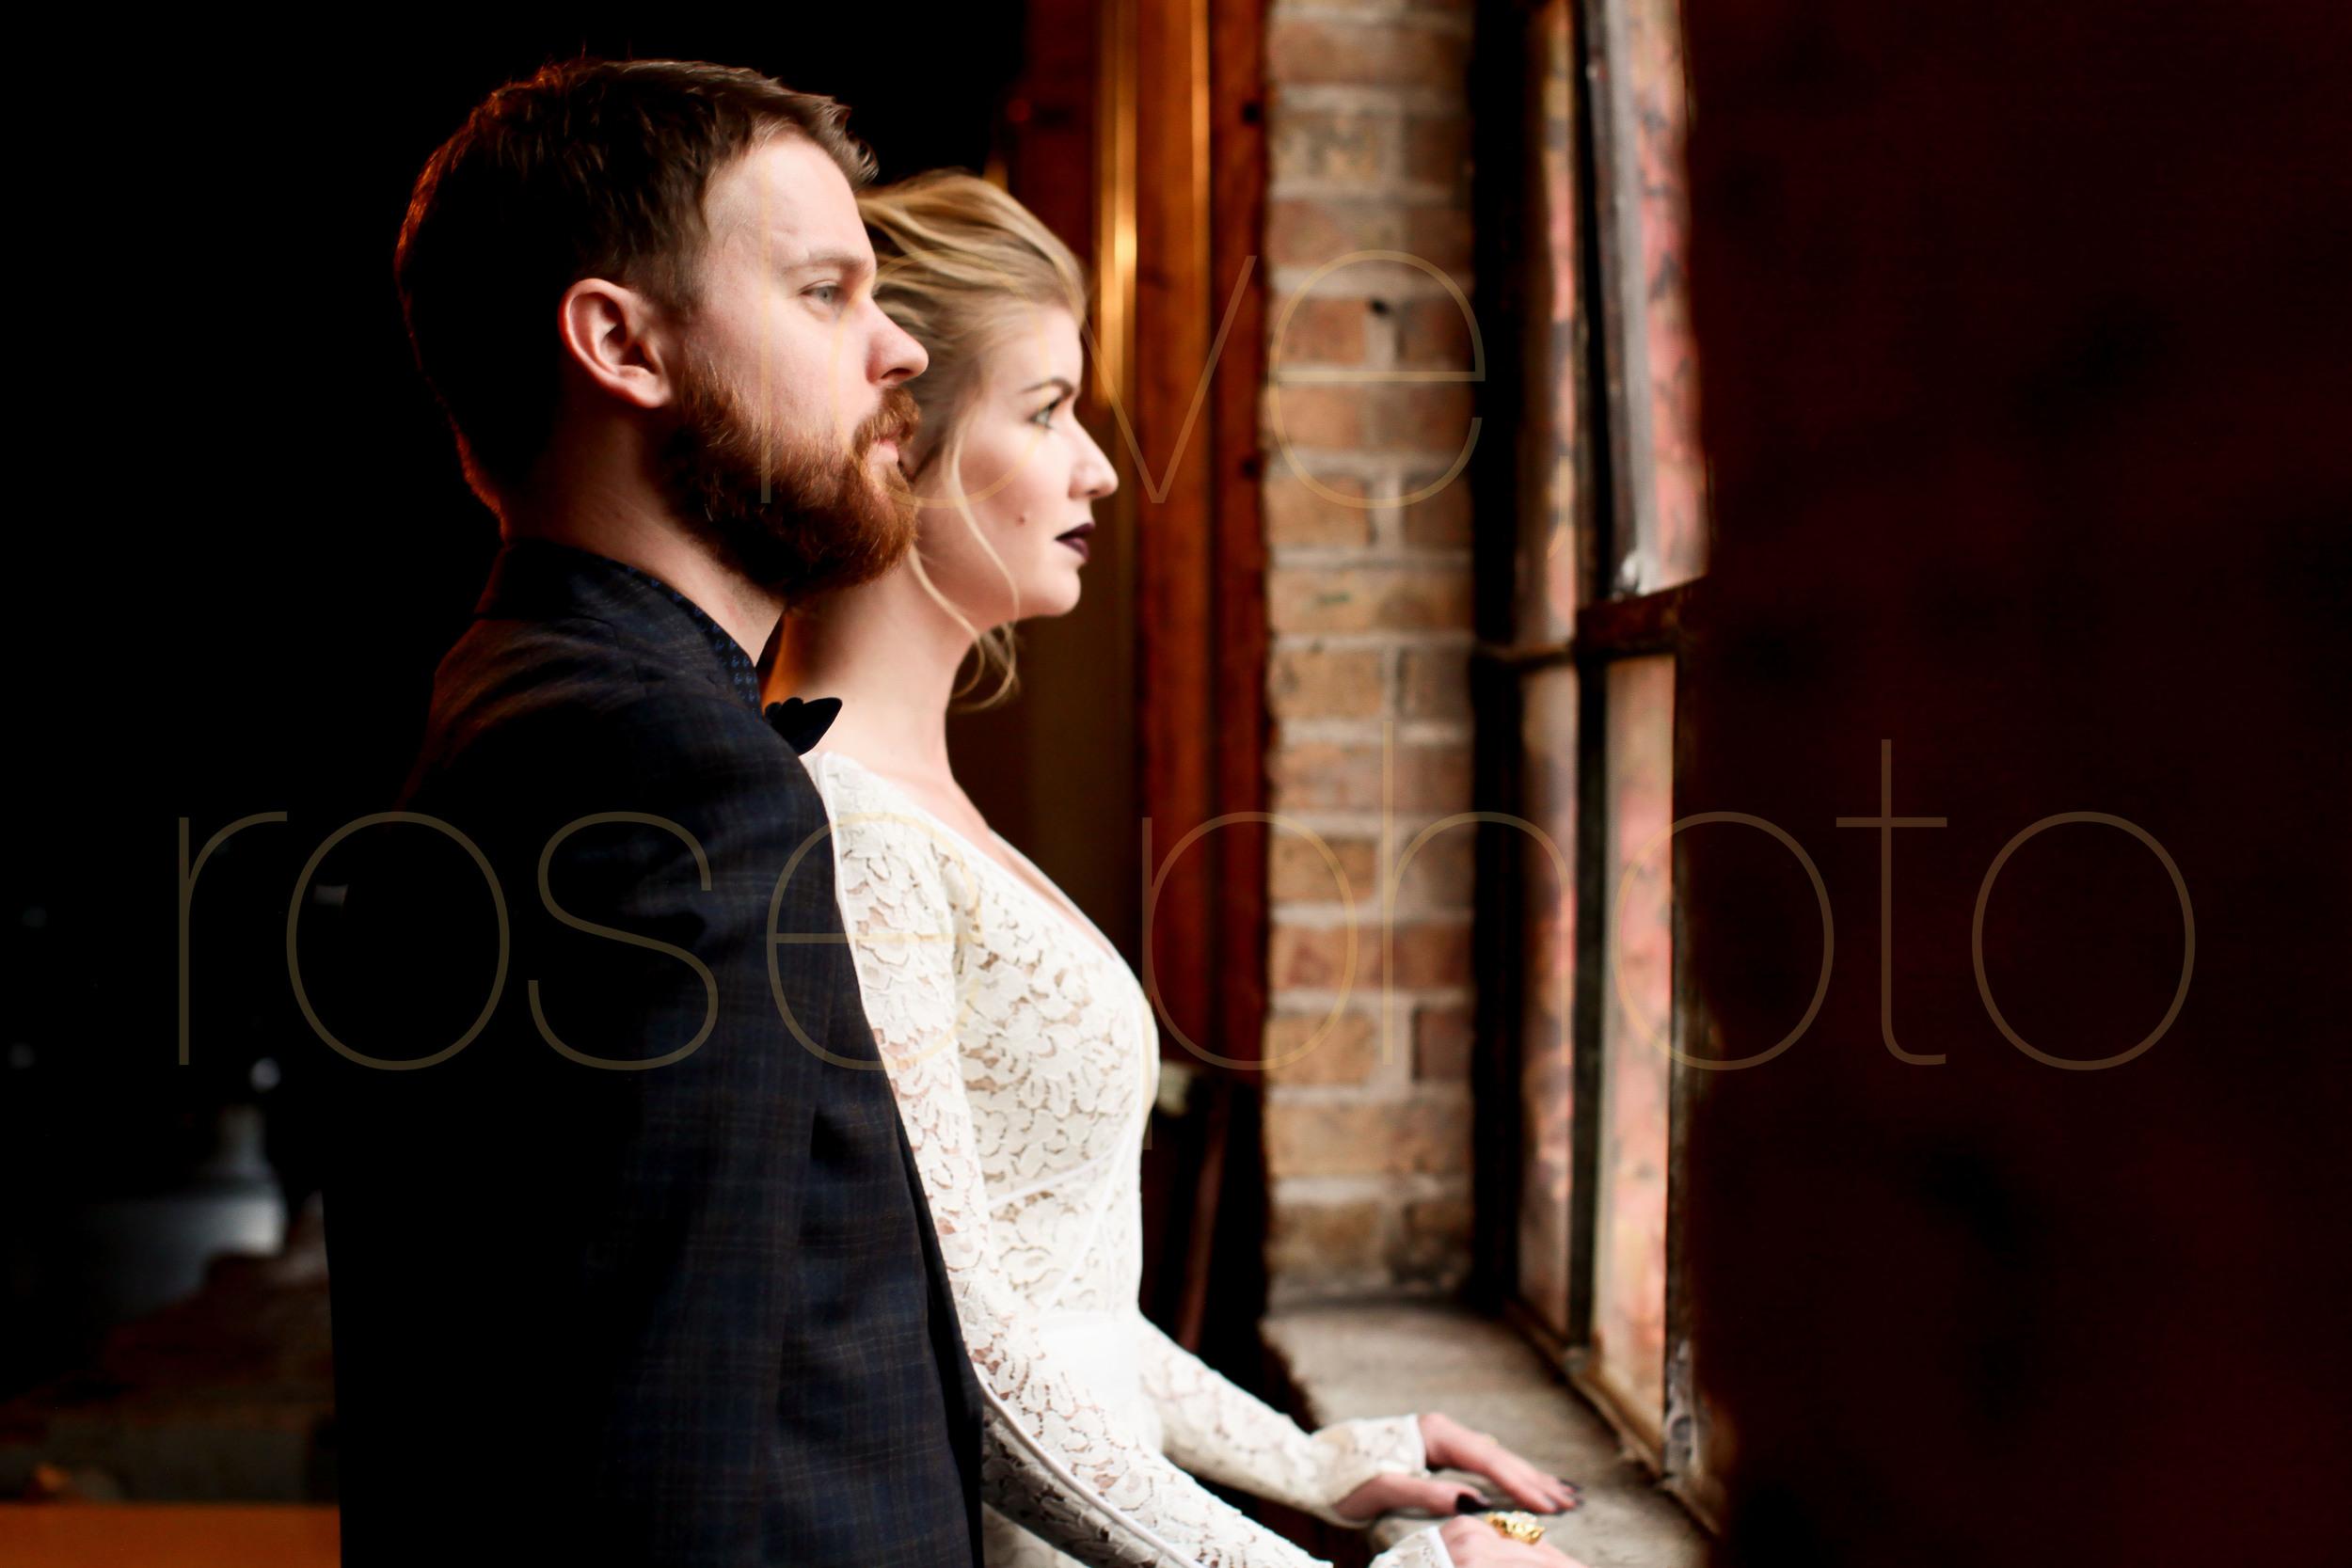 West Fulton Chicago Wedding Venue Salvage One photography enagement photos bride groom first dance-20.jpg